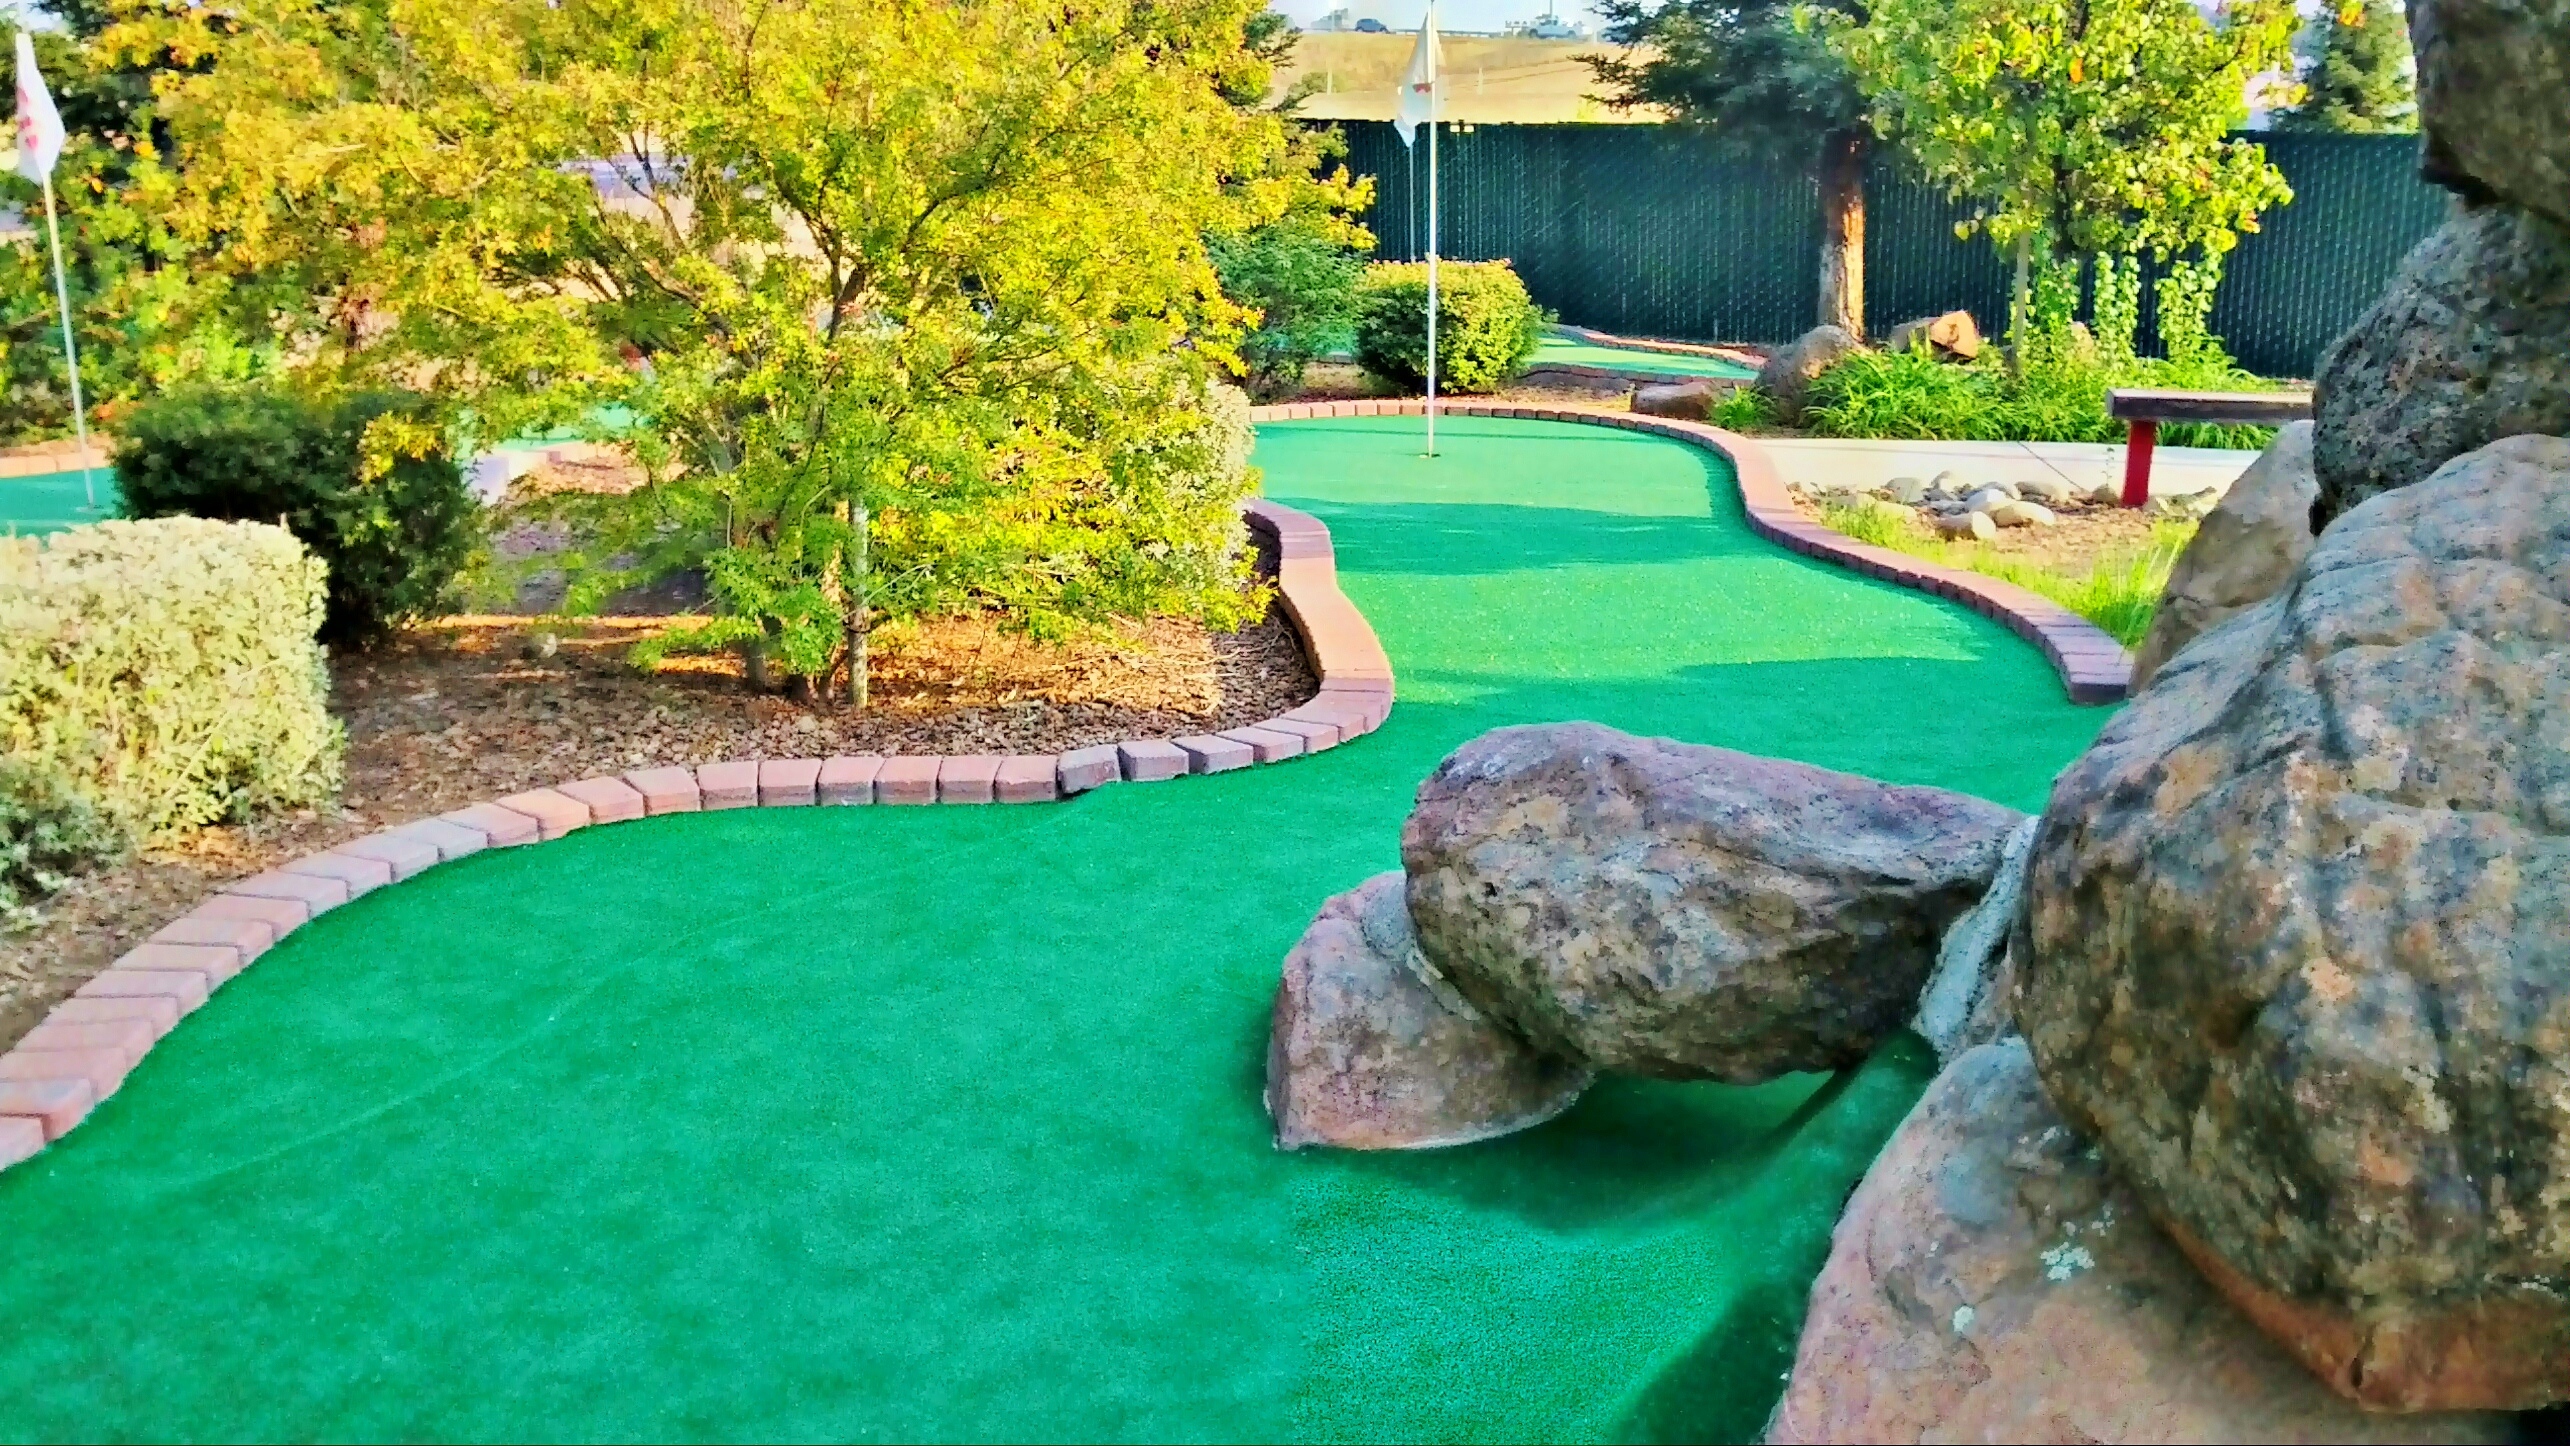 Miniature Golf   FunLand Chico